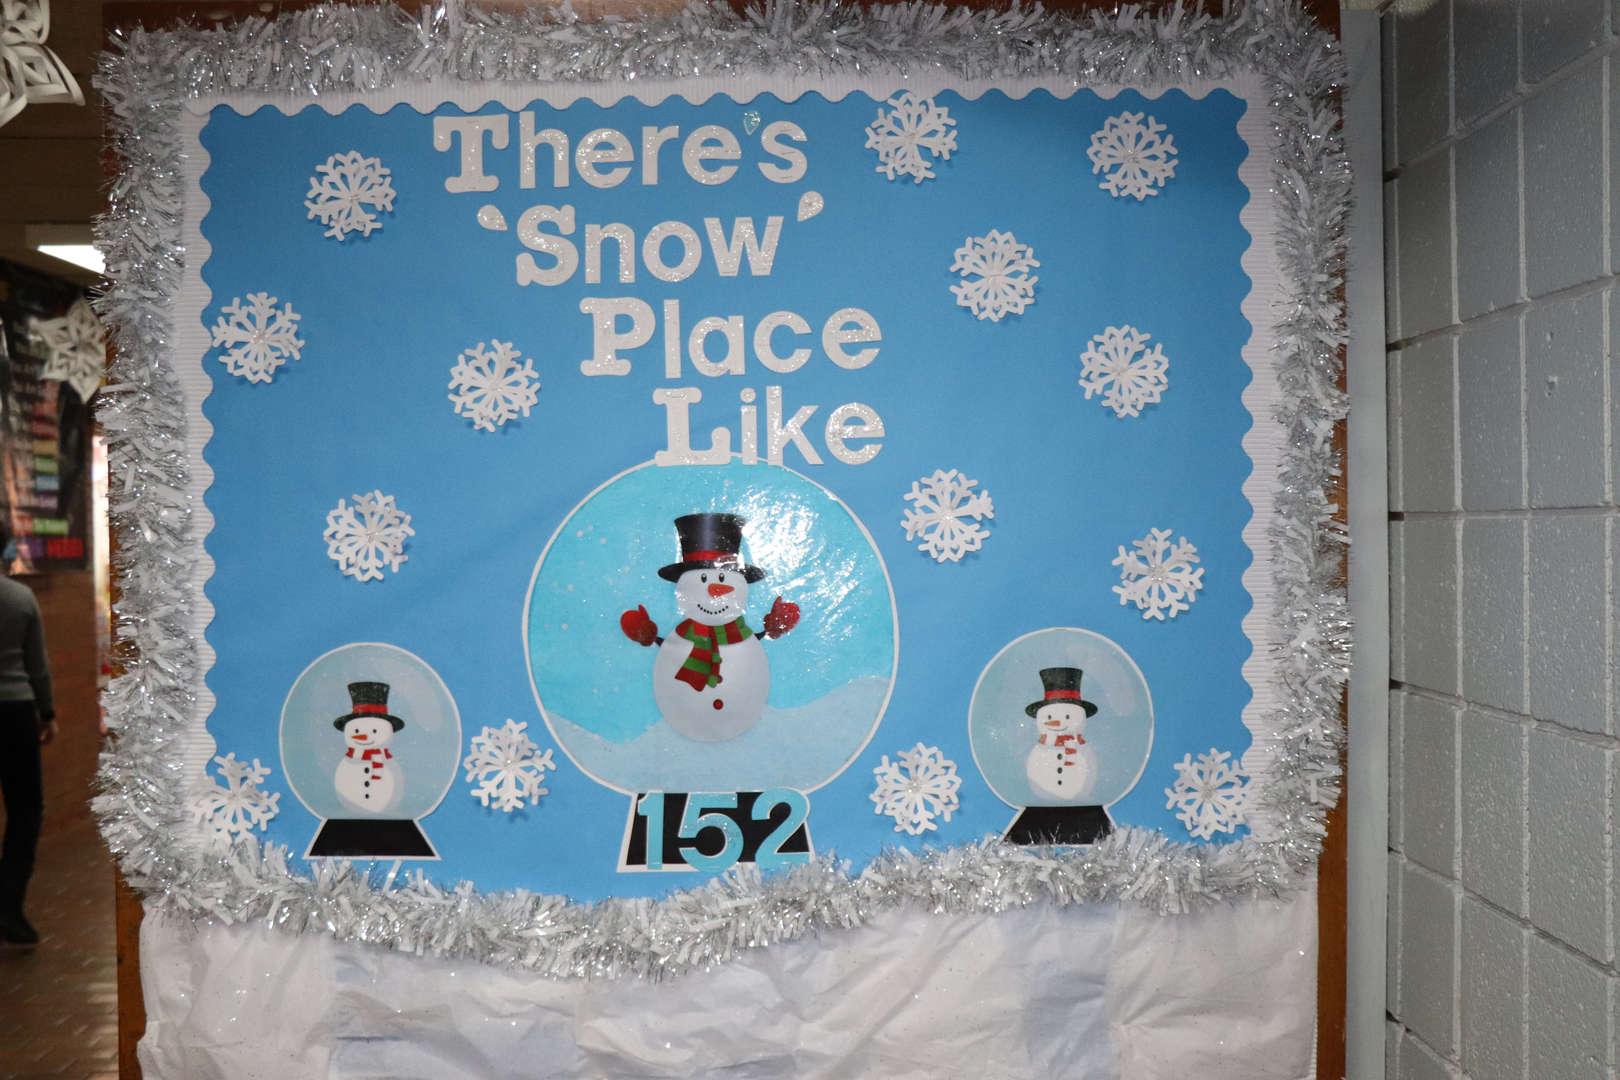 The winter bulletin board in the main lobby.